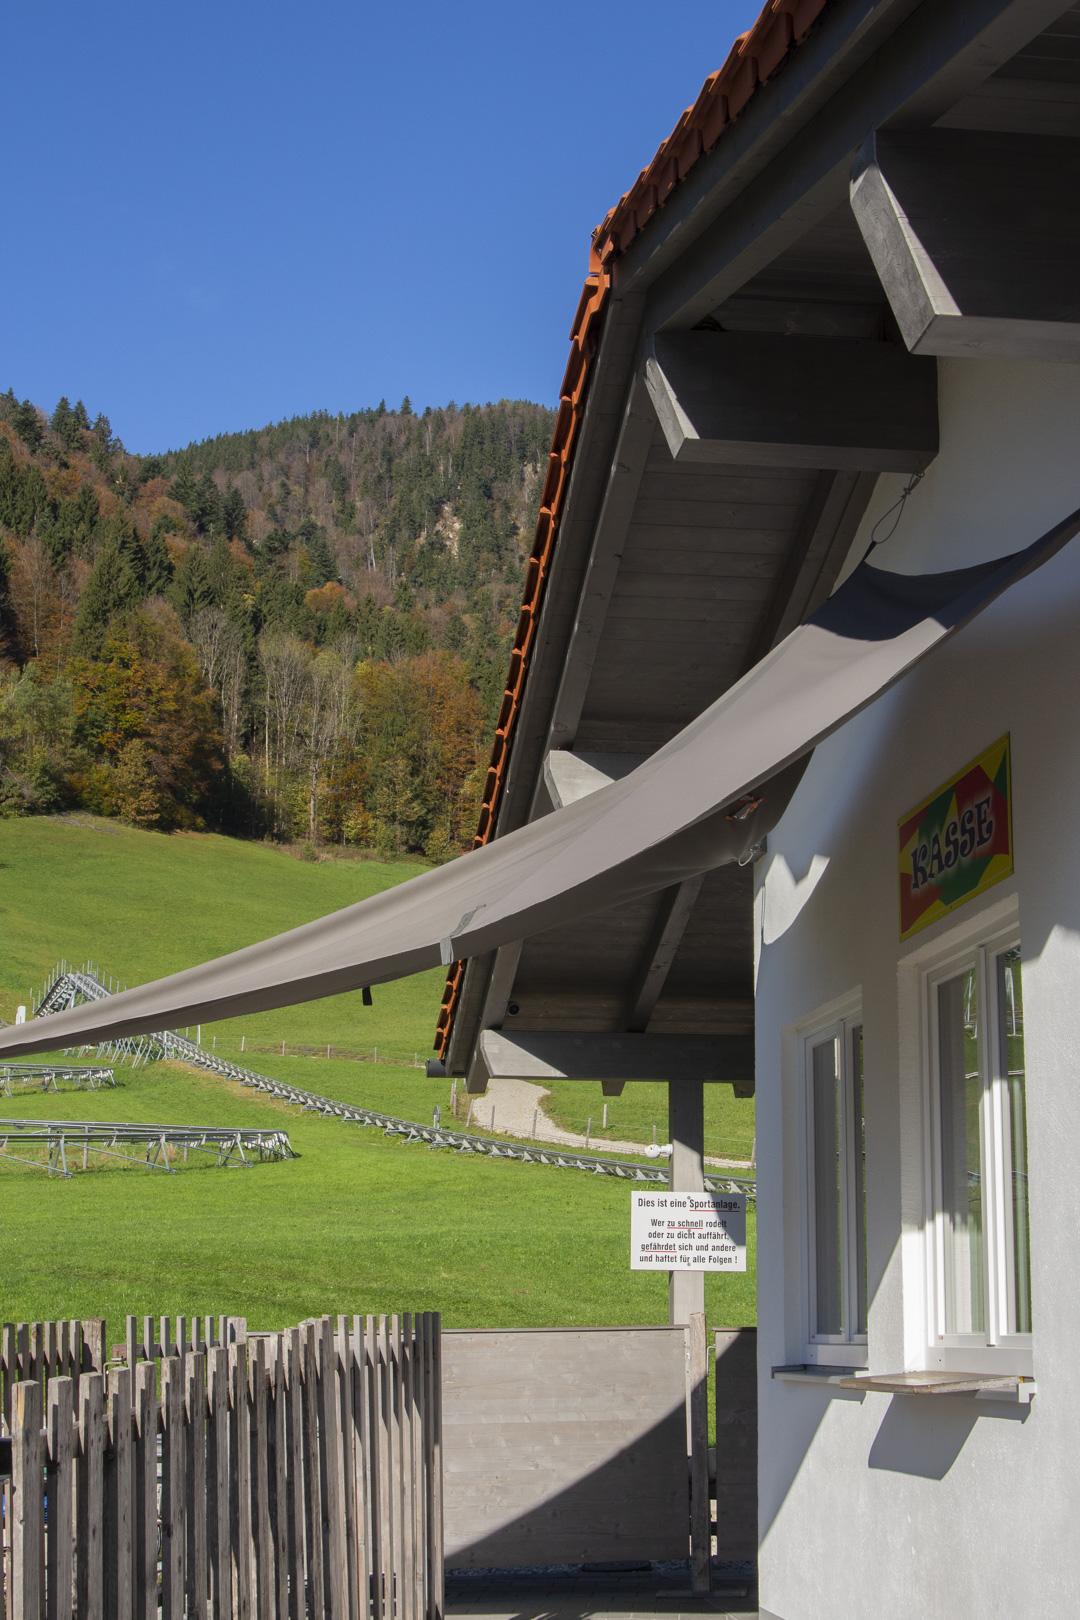 Galerie Gewerbebauten - Chiemgau Coaster Ruhpolding 3